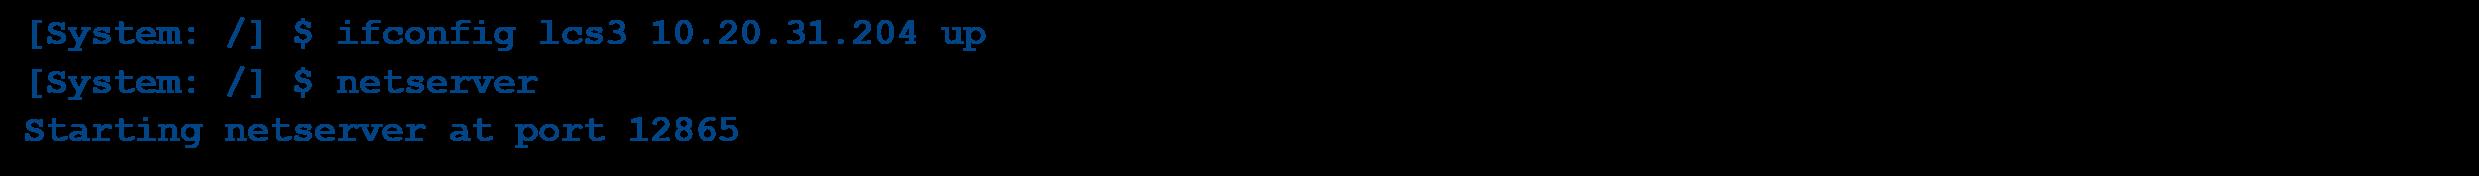 Tim-012